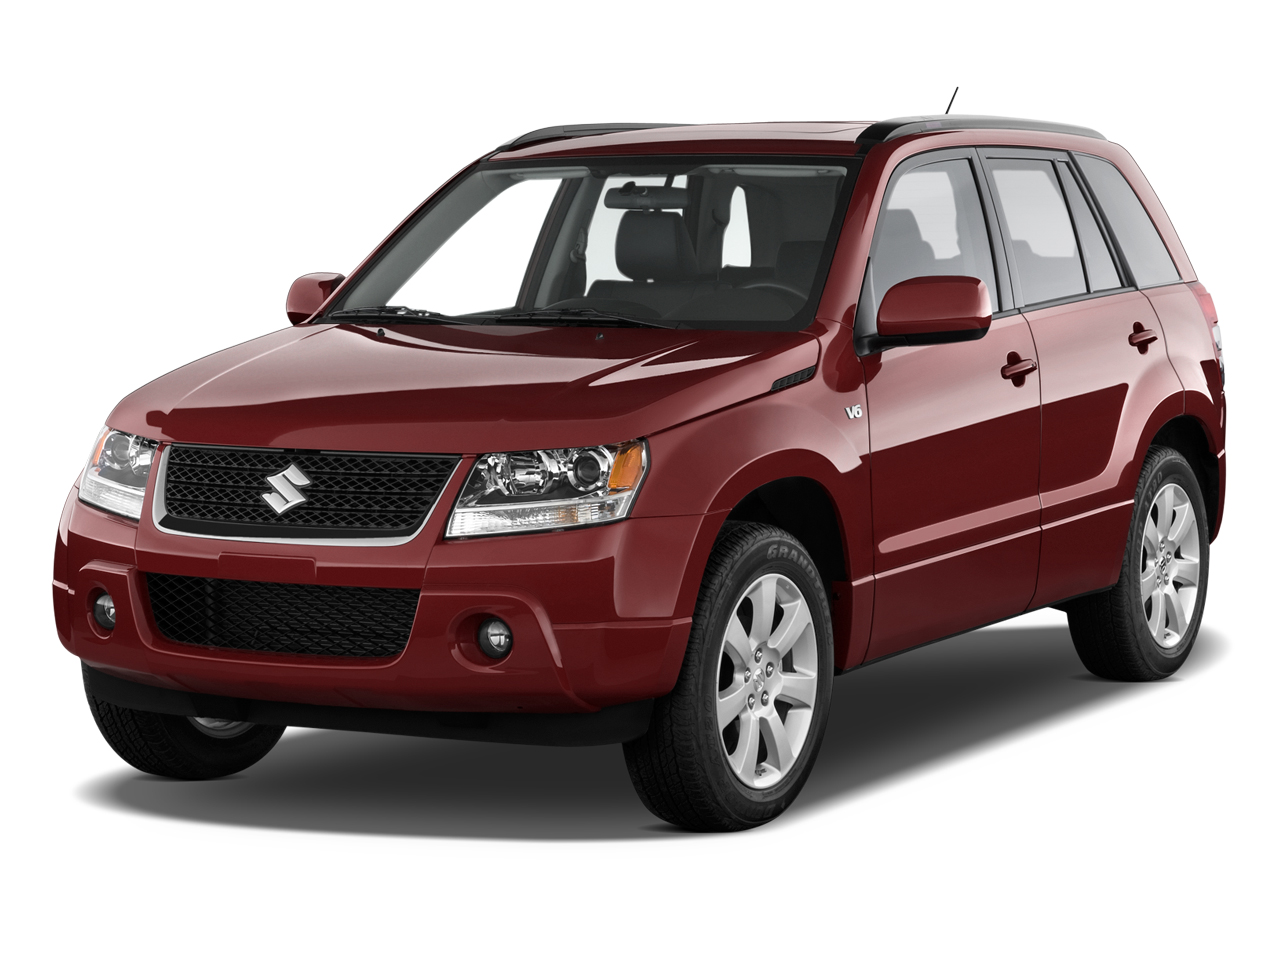 Suzuki Grand Vitara Albuquerque For Sale